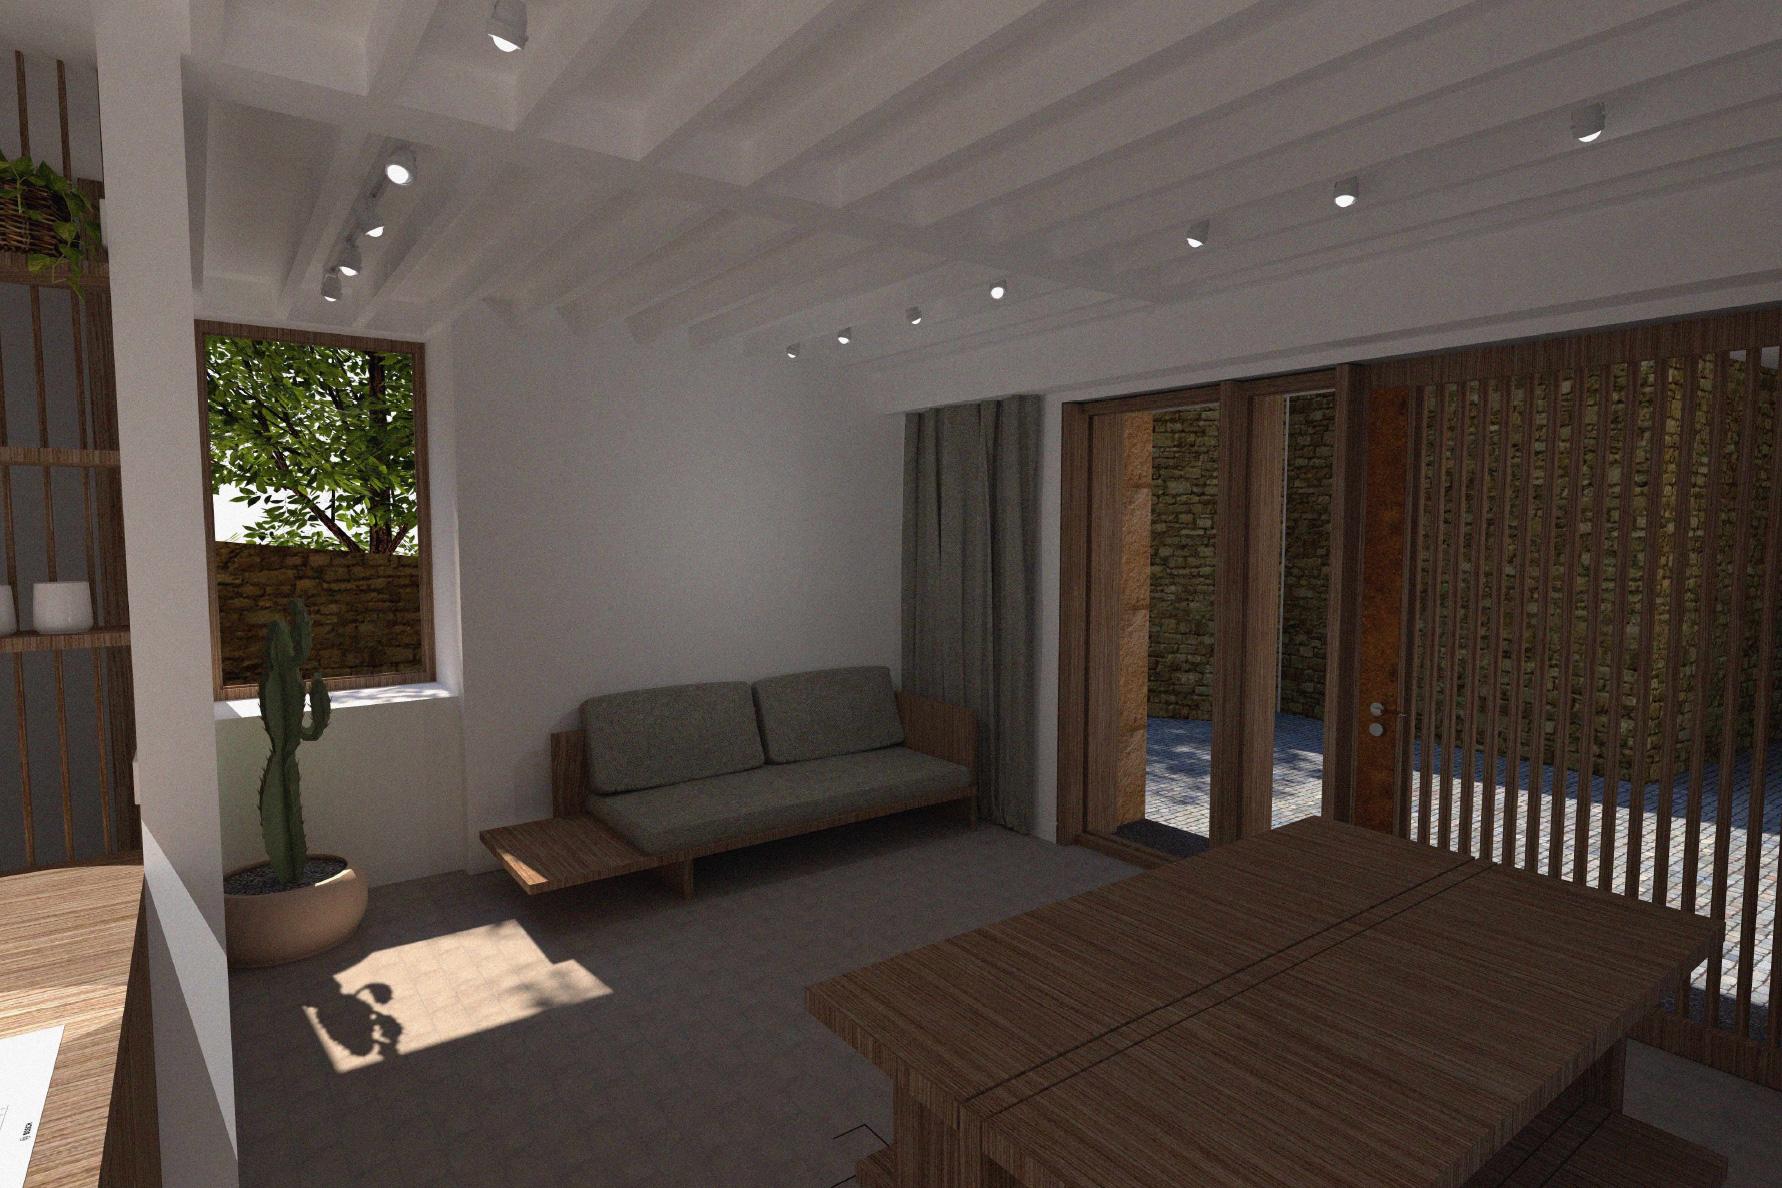 porteous studio interior wooden